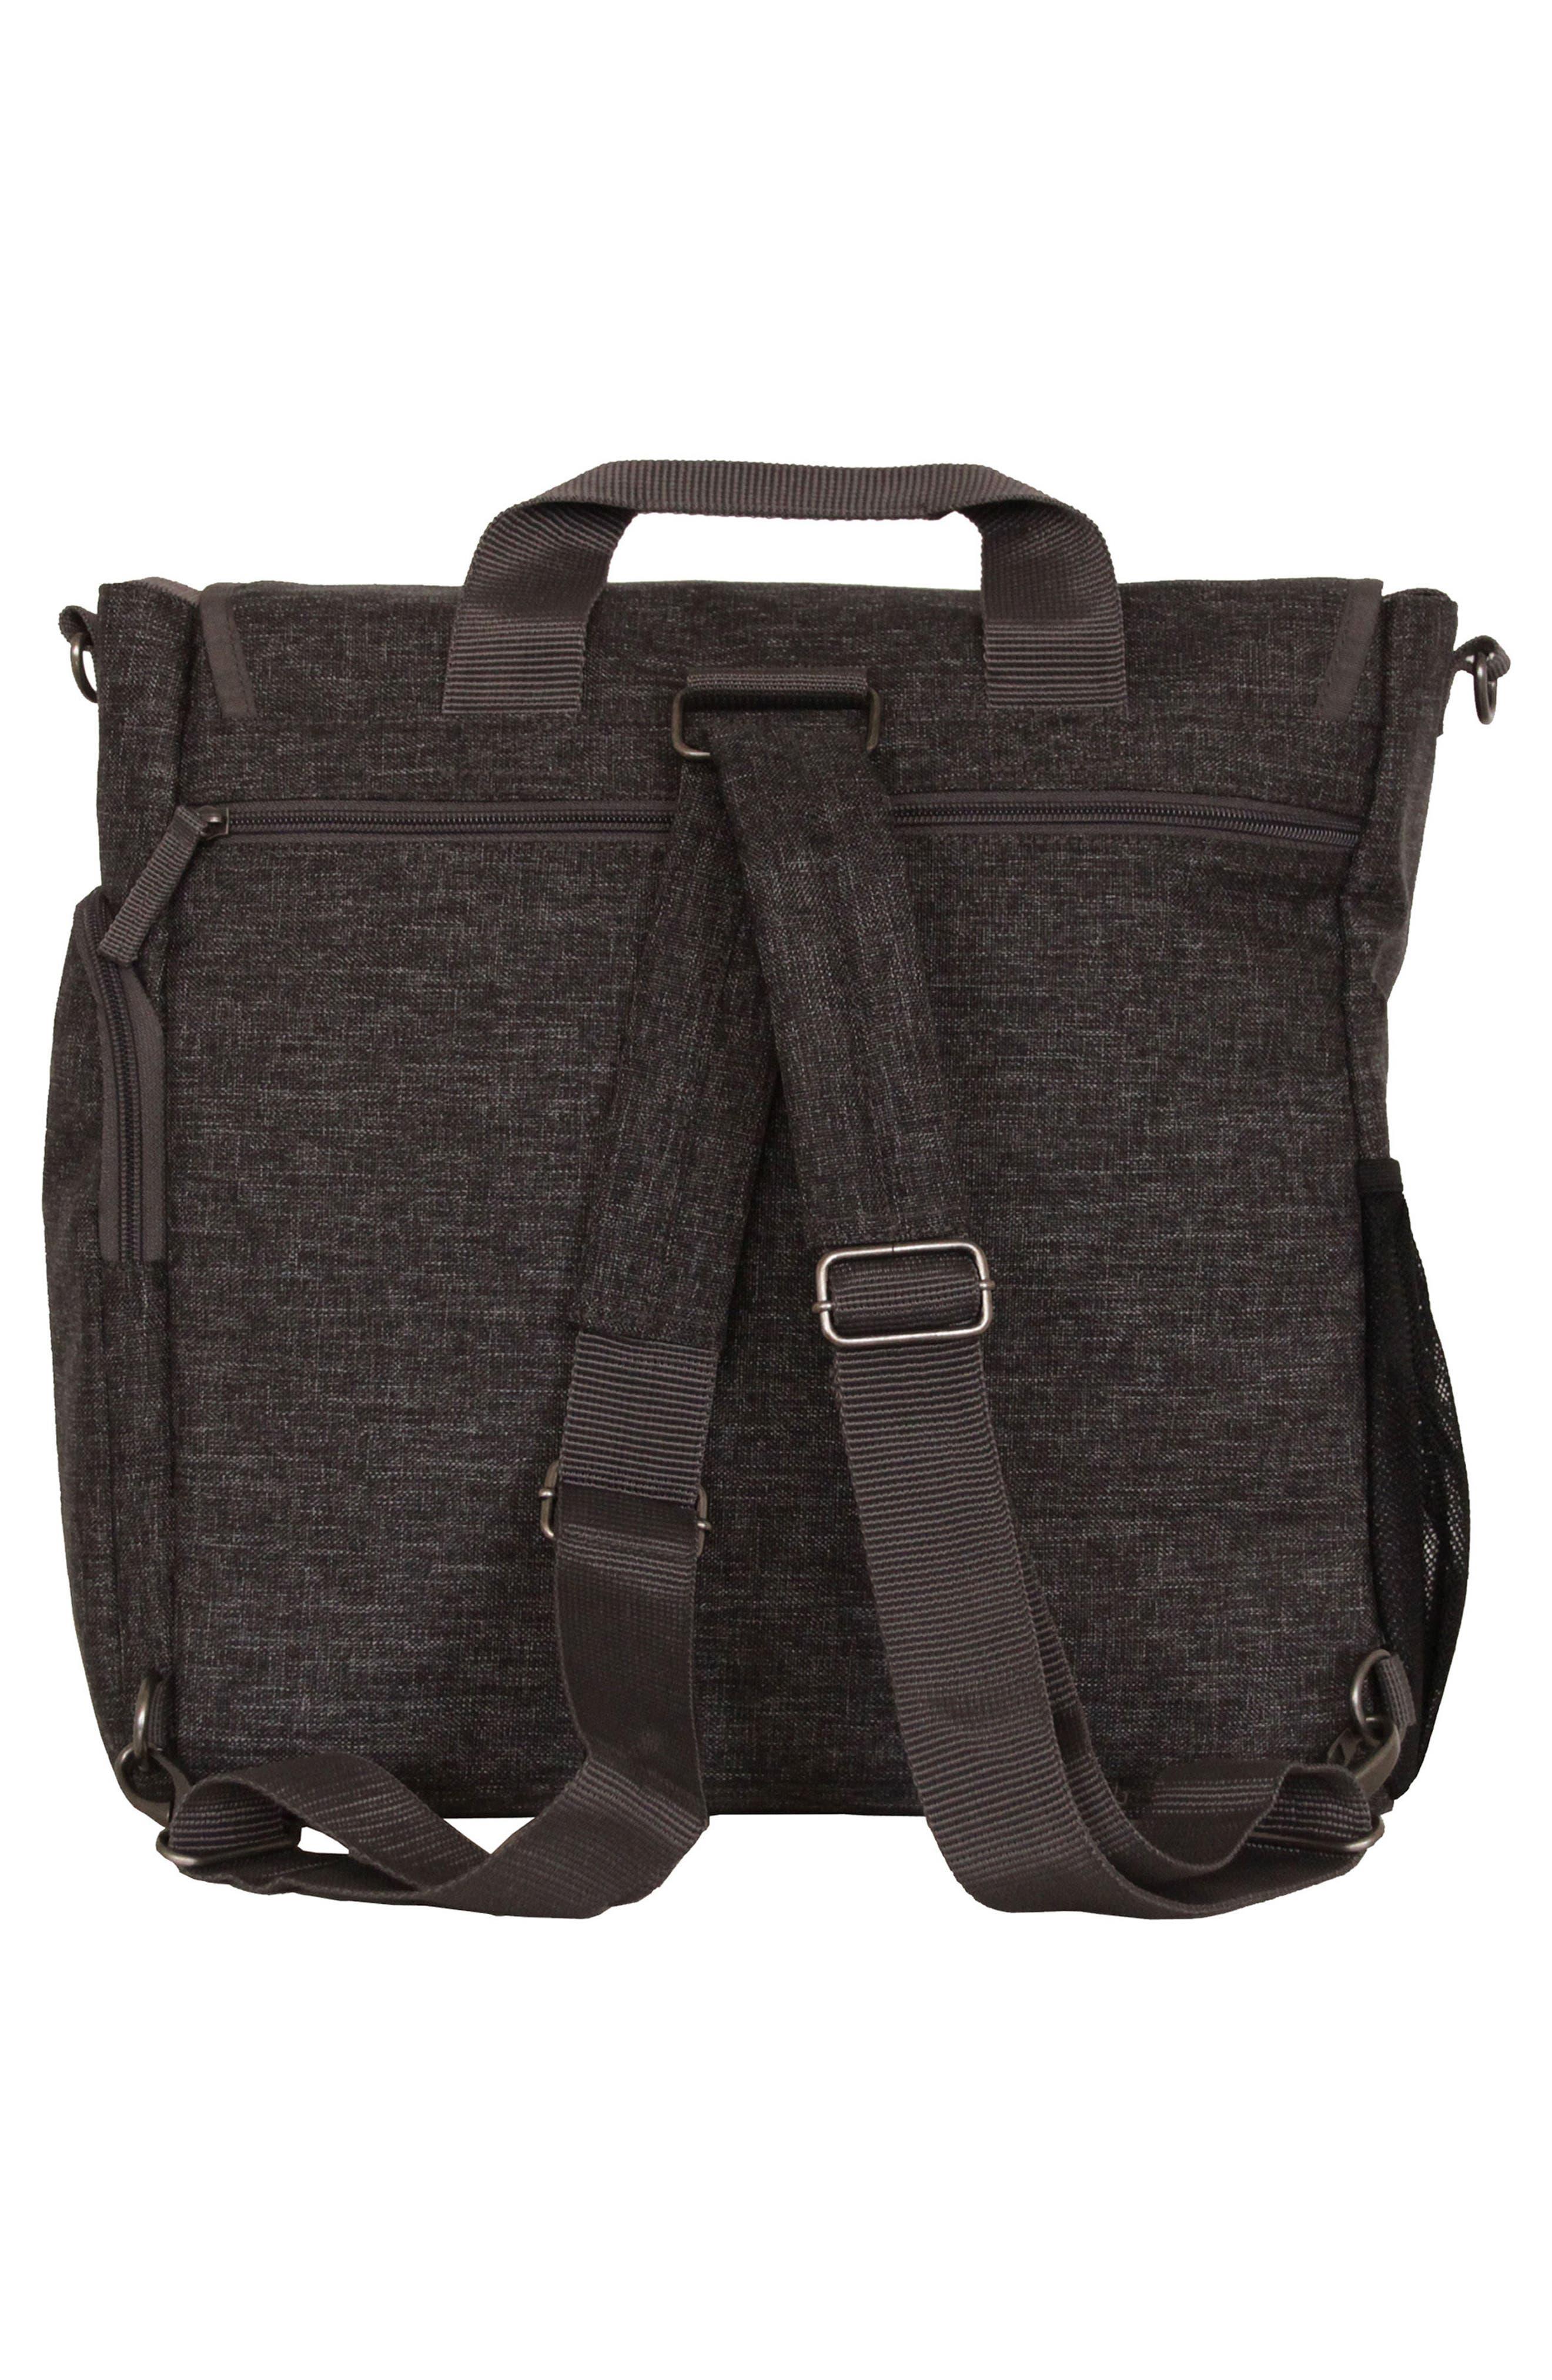 Convertible Diaper Backpack,                             Alternate thumbnail 2, color,                             001